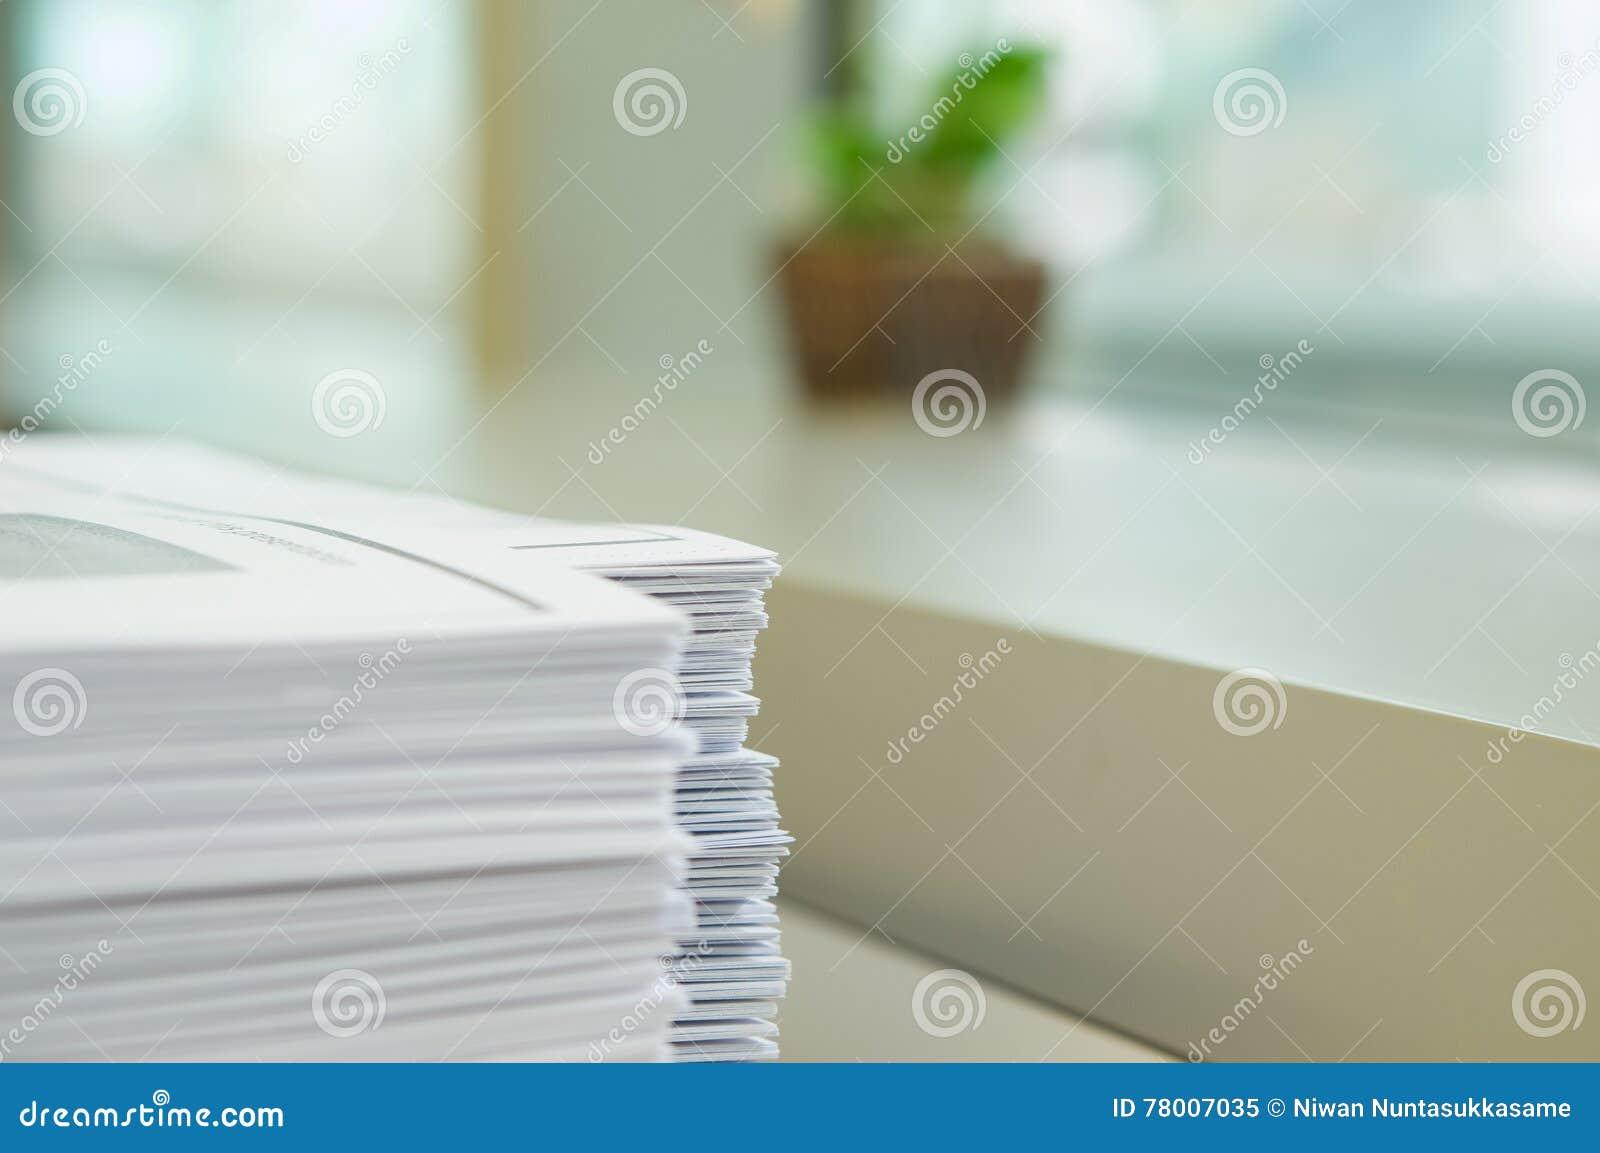 Mitteilungsblatt im Büro